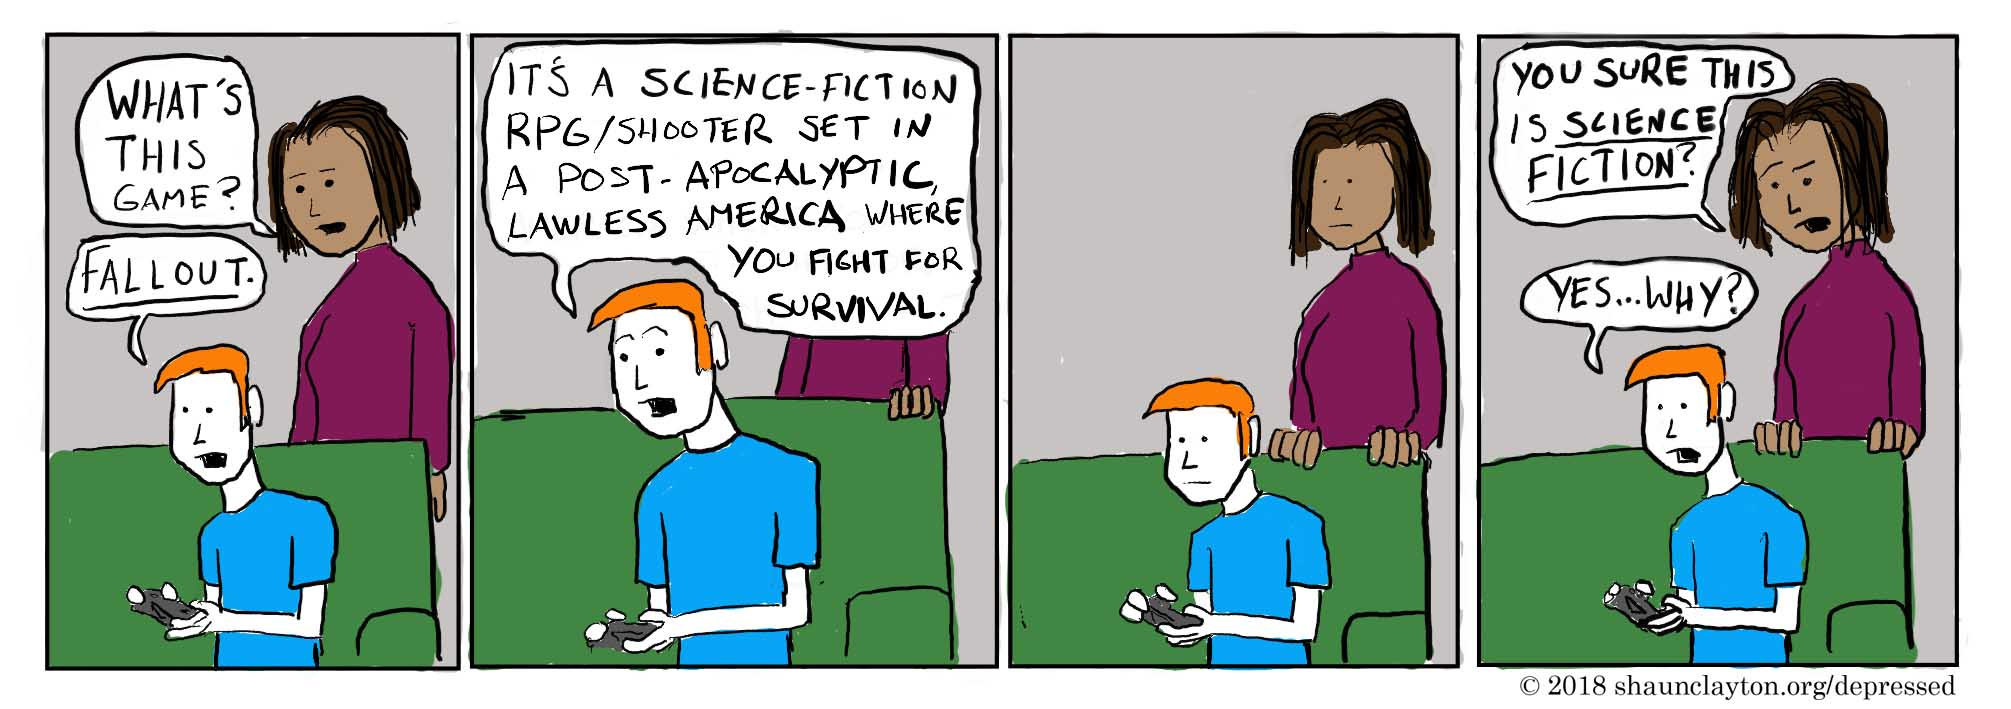 Modern Fallout